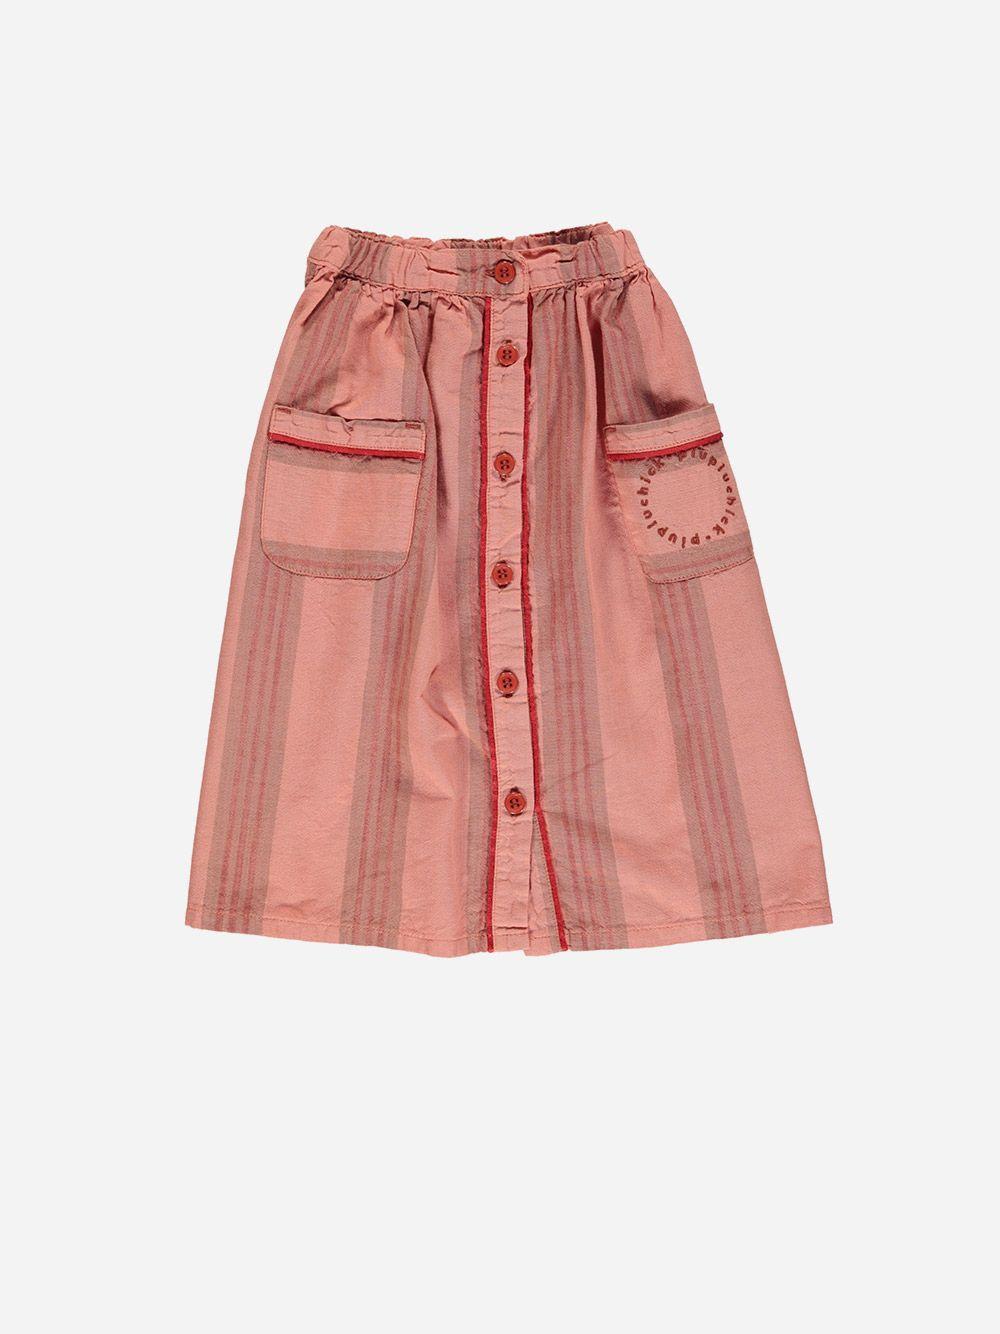 Long Skirt Pink & Multicolor Stripes